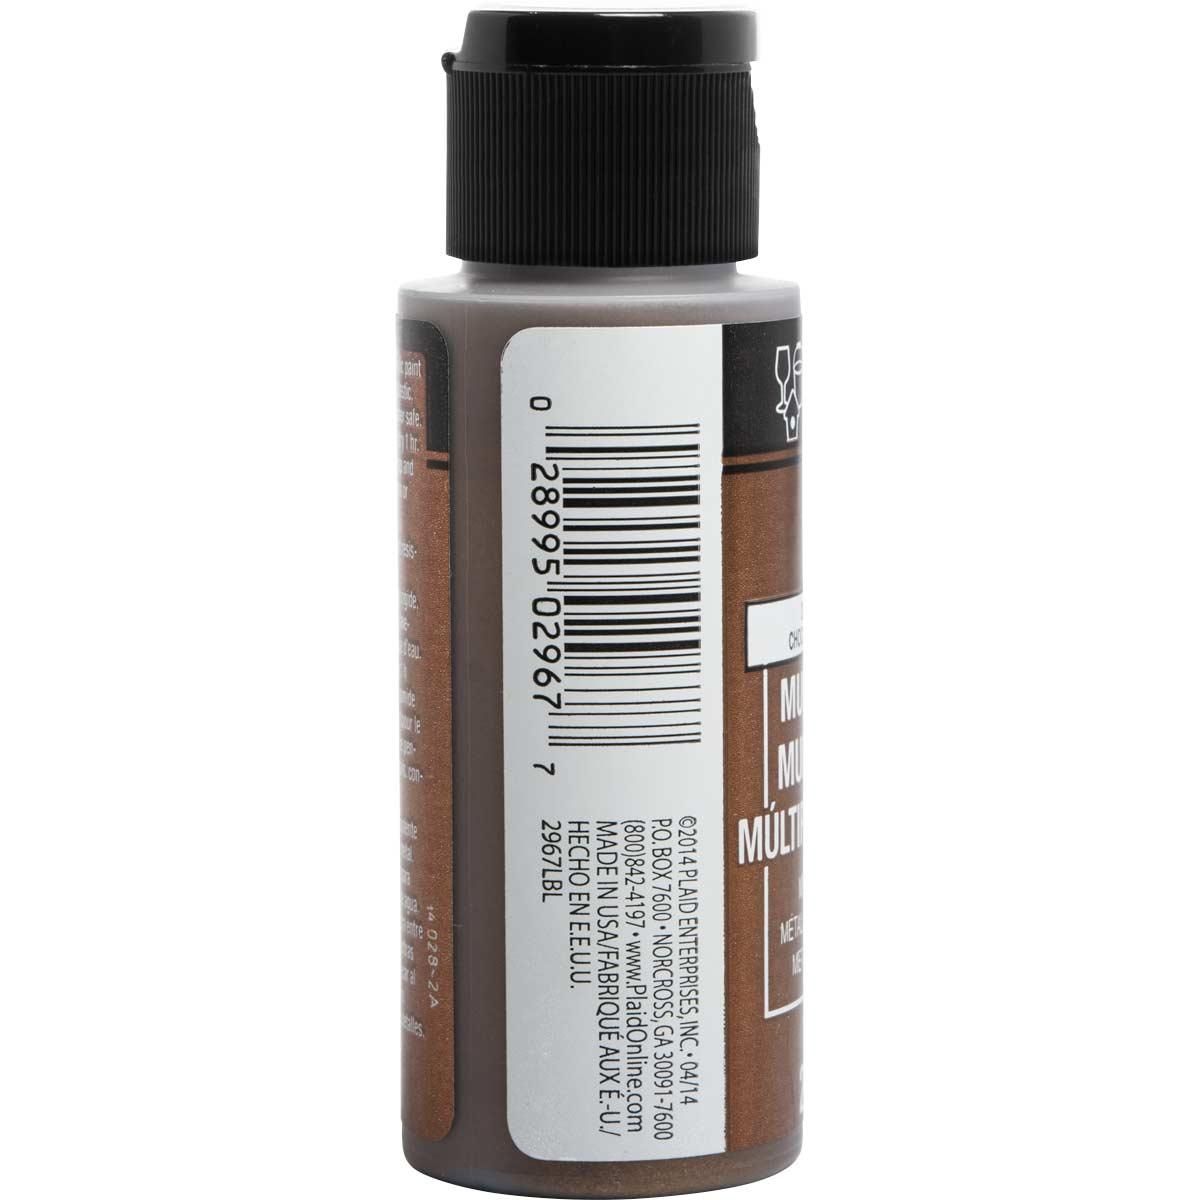 FolkArt ® Multi-Surface Metallic Acrylic Paints - Chocolate Brown, 2 oz.